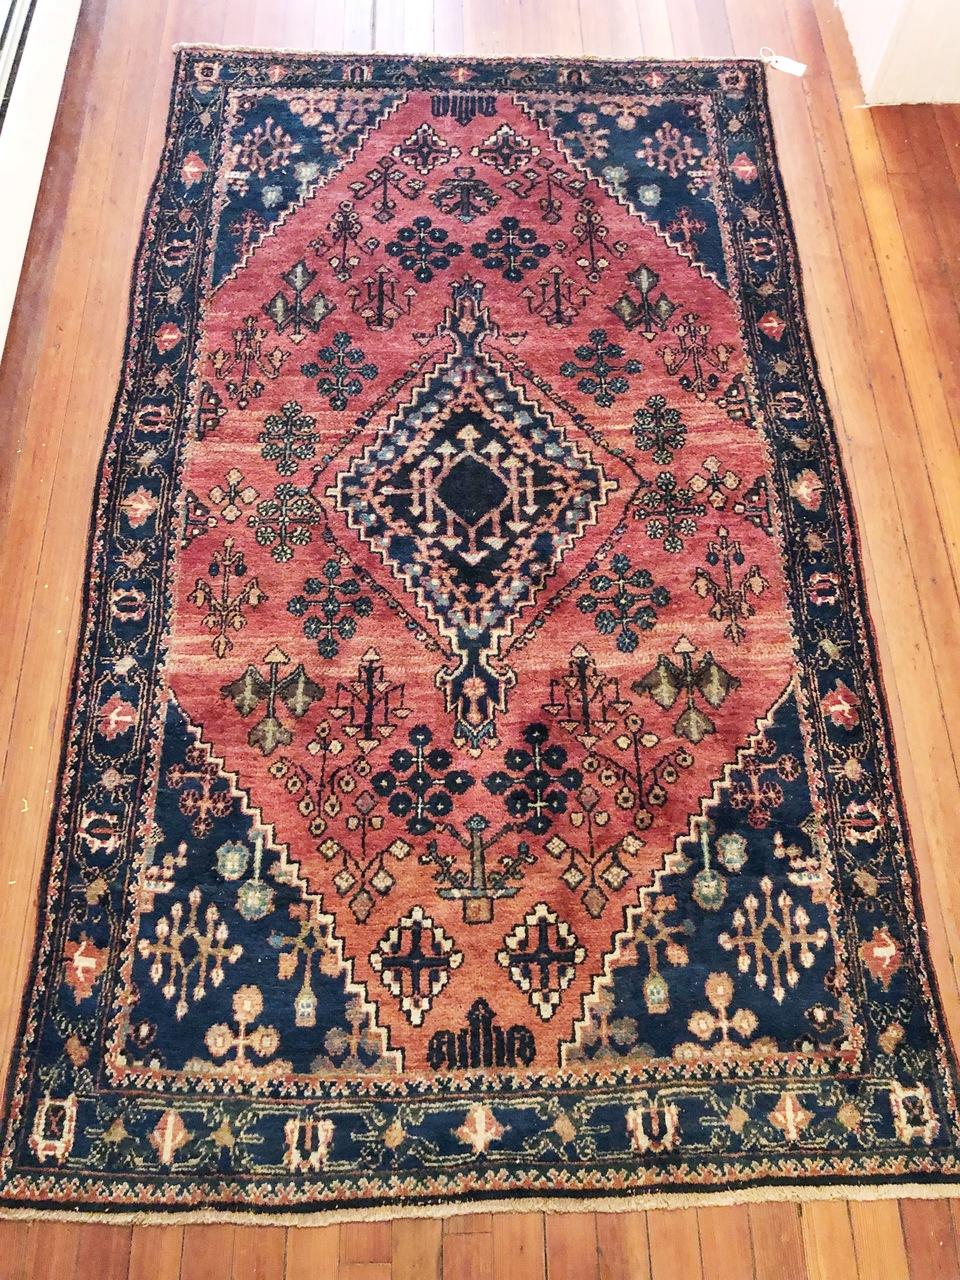 Antique Persian Rug No. 4